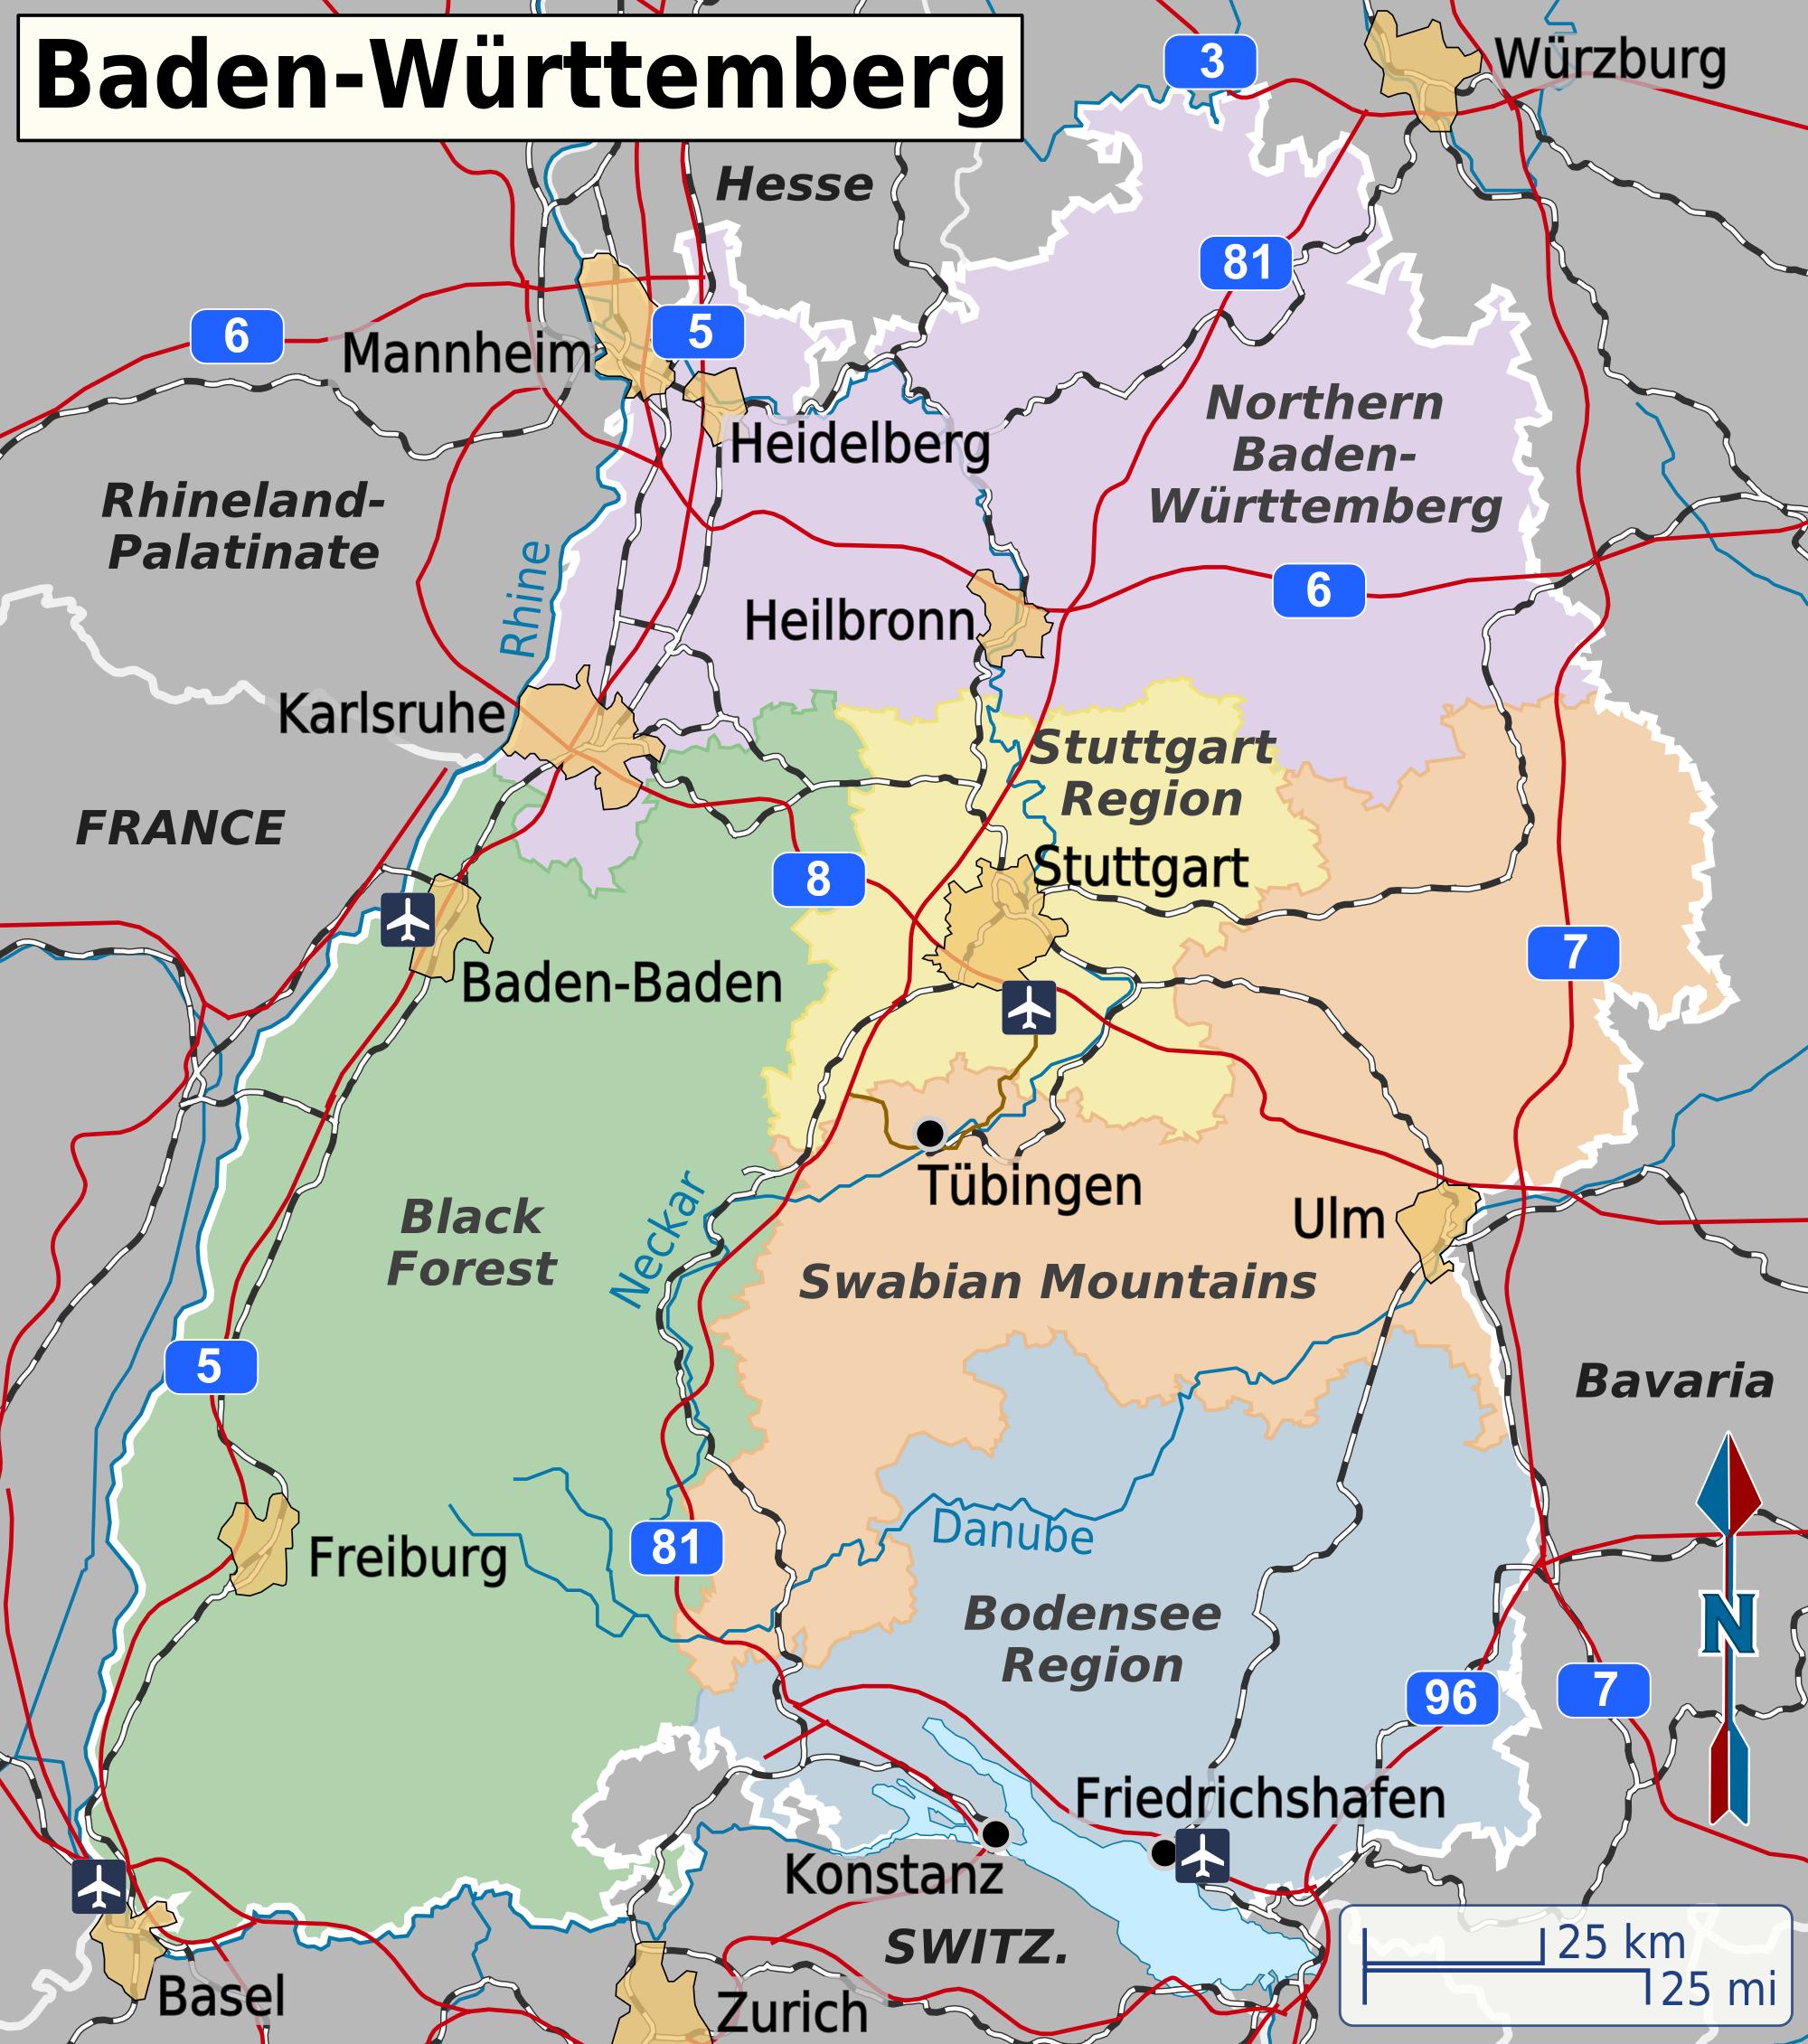 Baden Wurttemberg Karte Db.Baden Wurttemberg Travel Guide At Wikivoyage